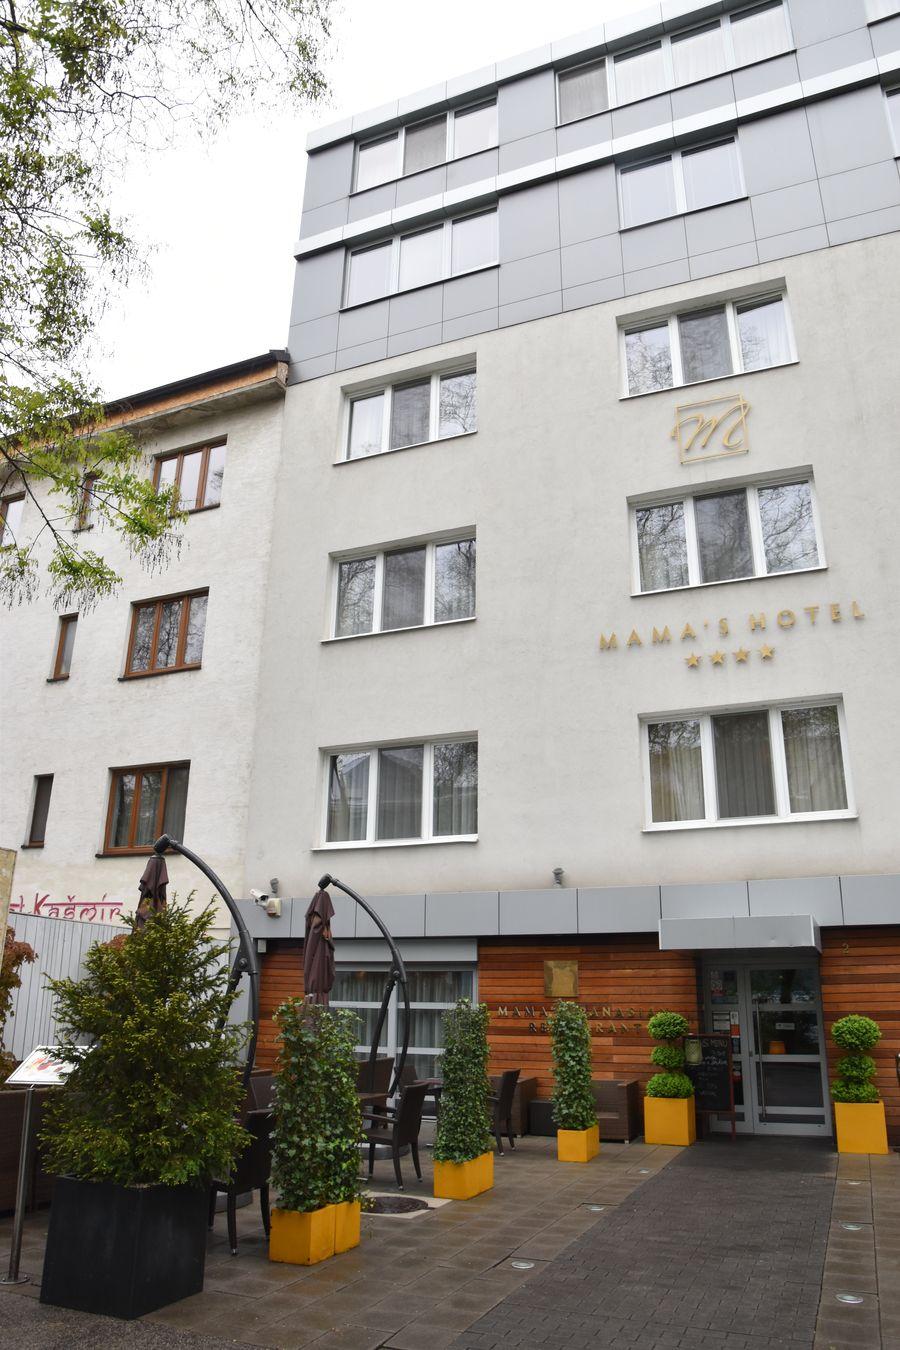 A boutique quiet hotel in bratislava hotel mama 39 s for Mamas design boutique hotel bratislava